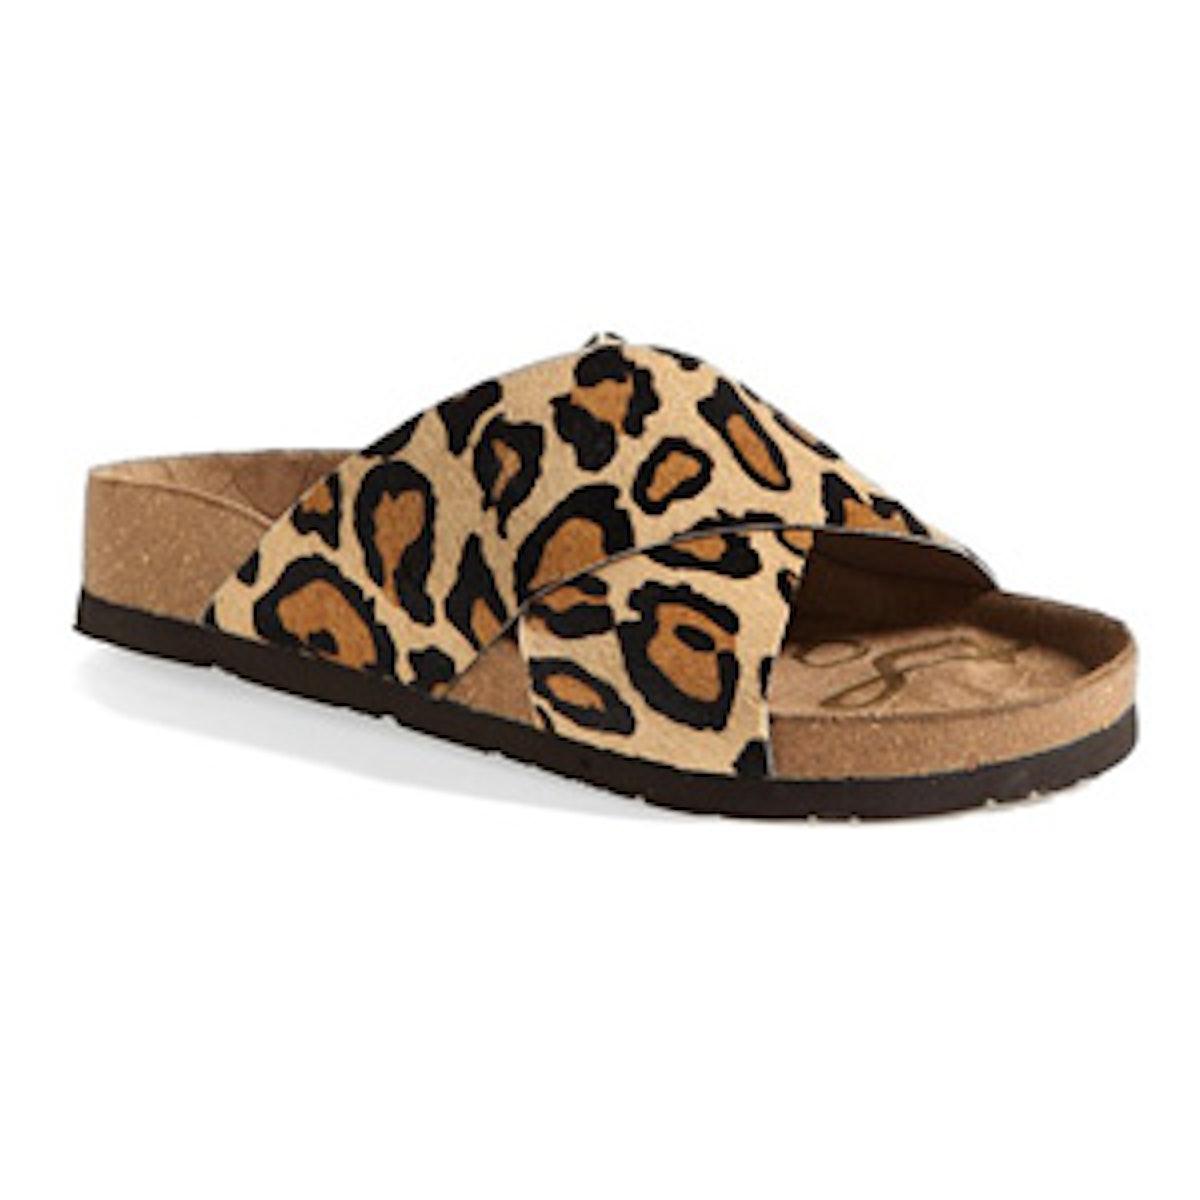 Leopard Print Adora Sandal